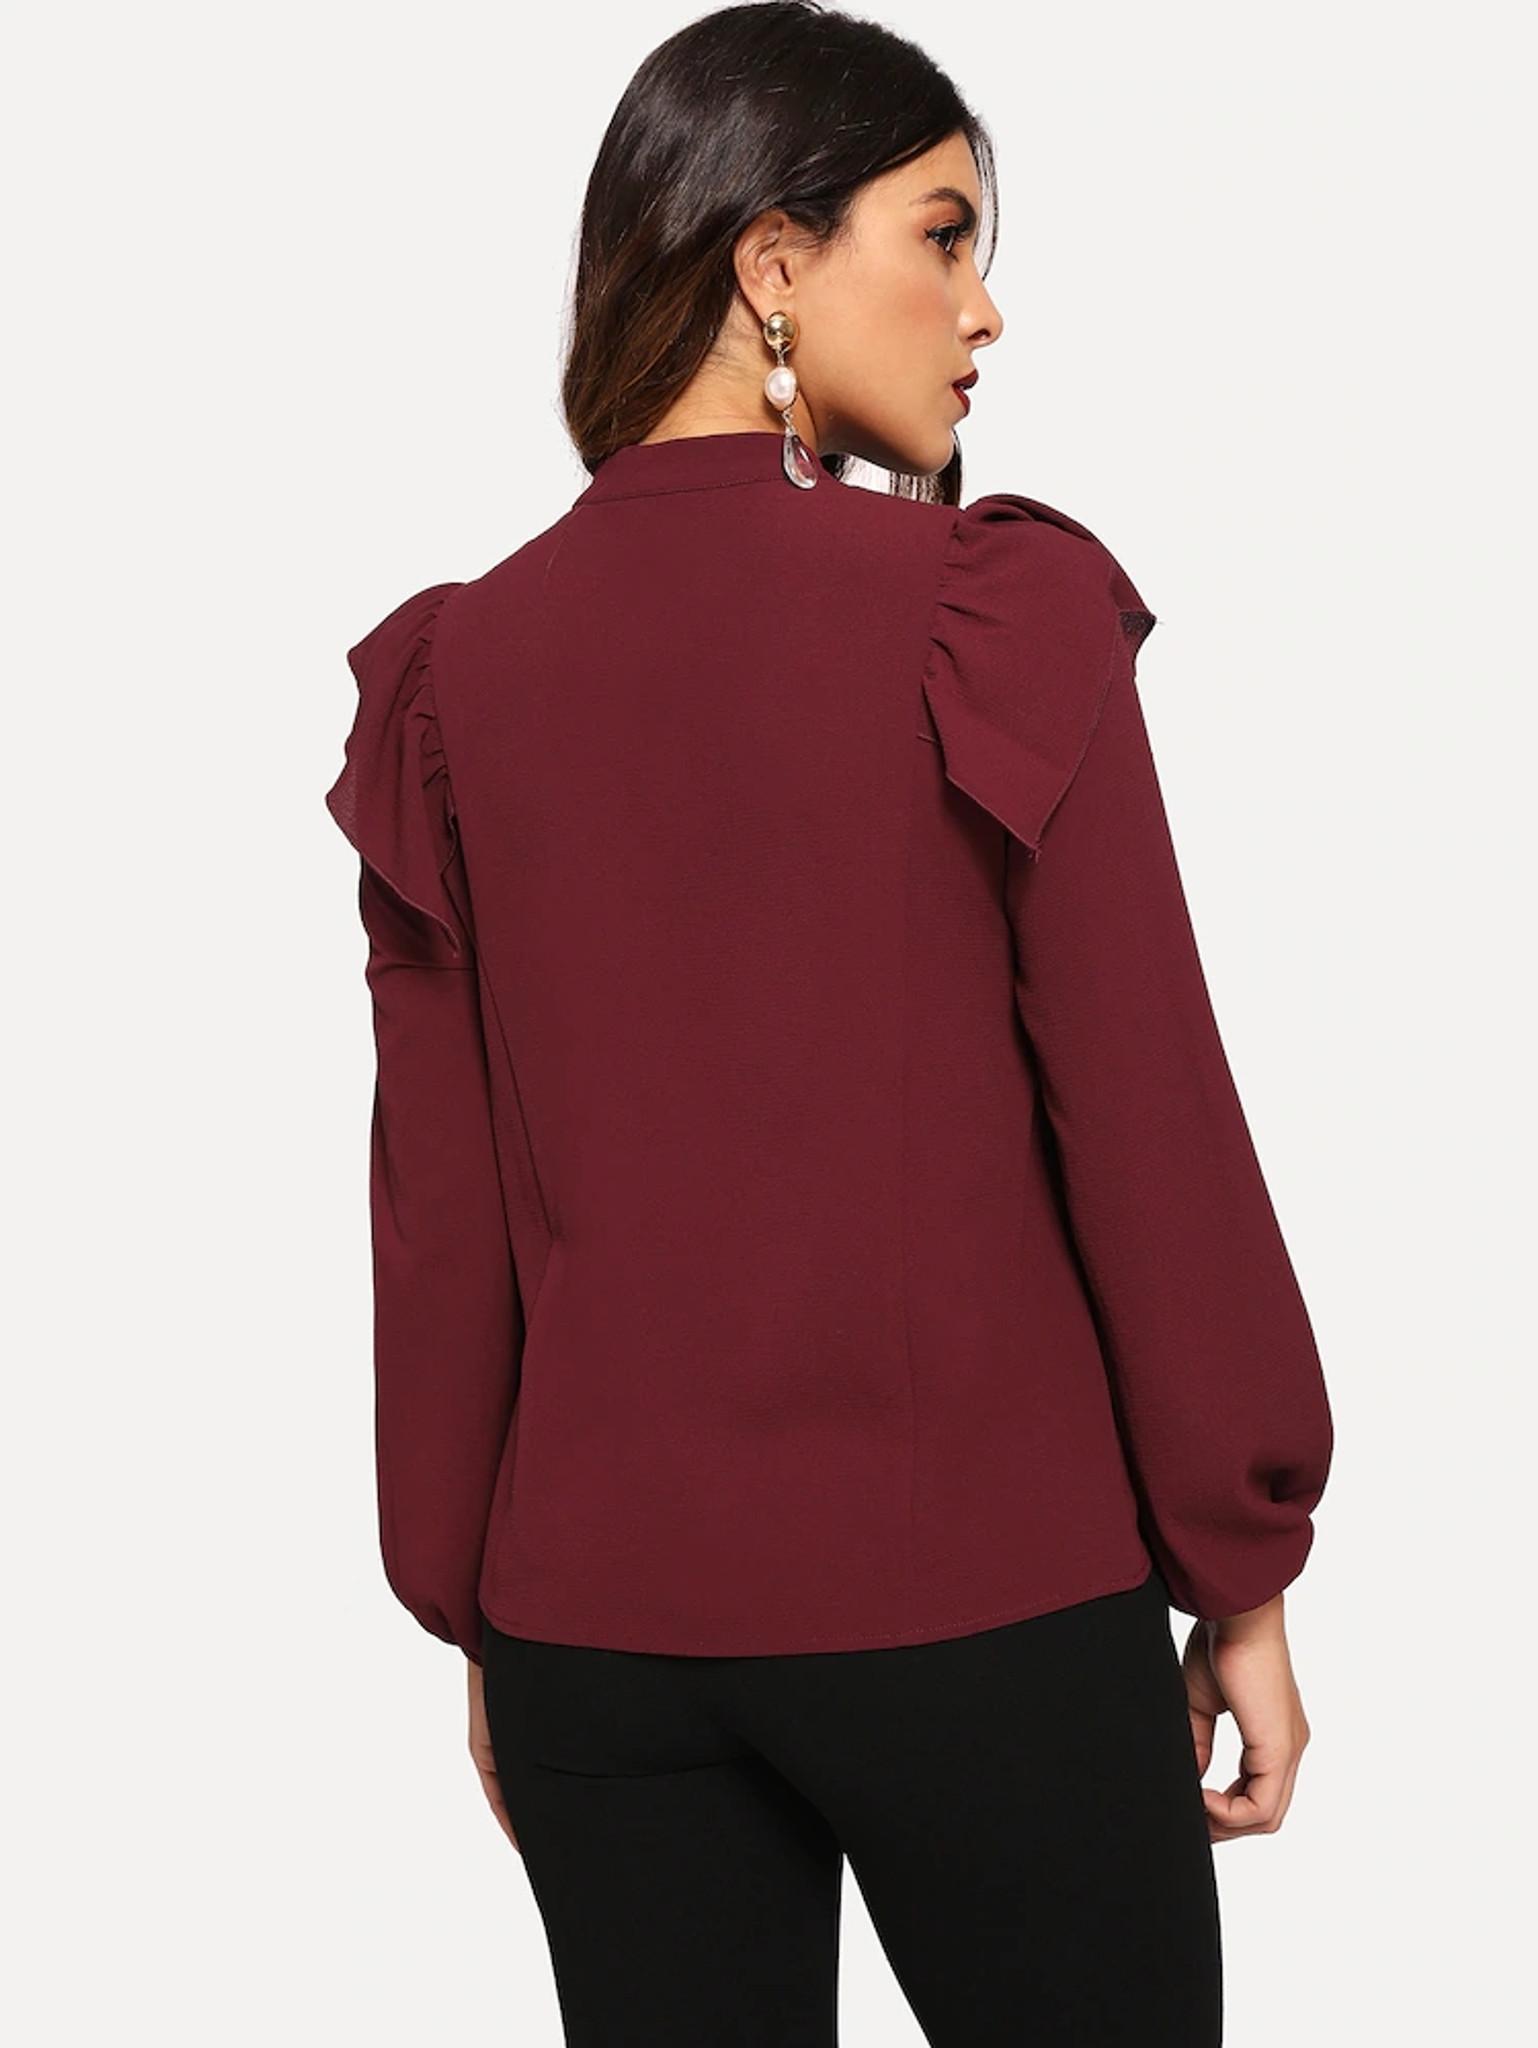 Fifth Avenue Women's UVA1317 Choker Neck Ruffle Detail Blouse - Maroon